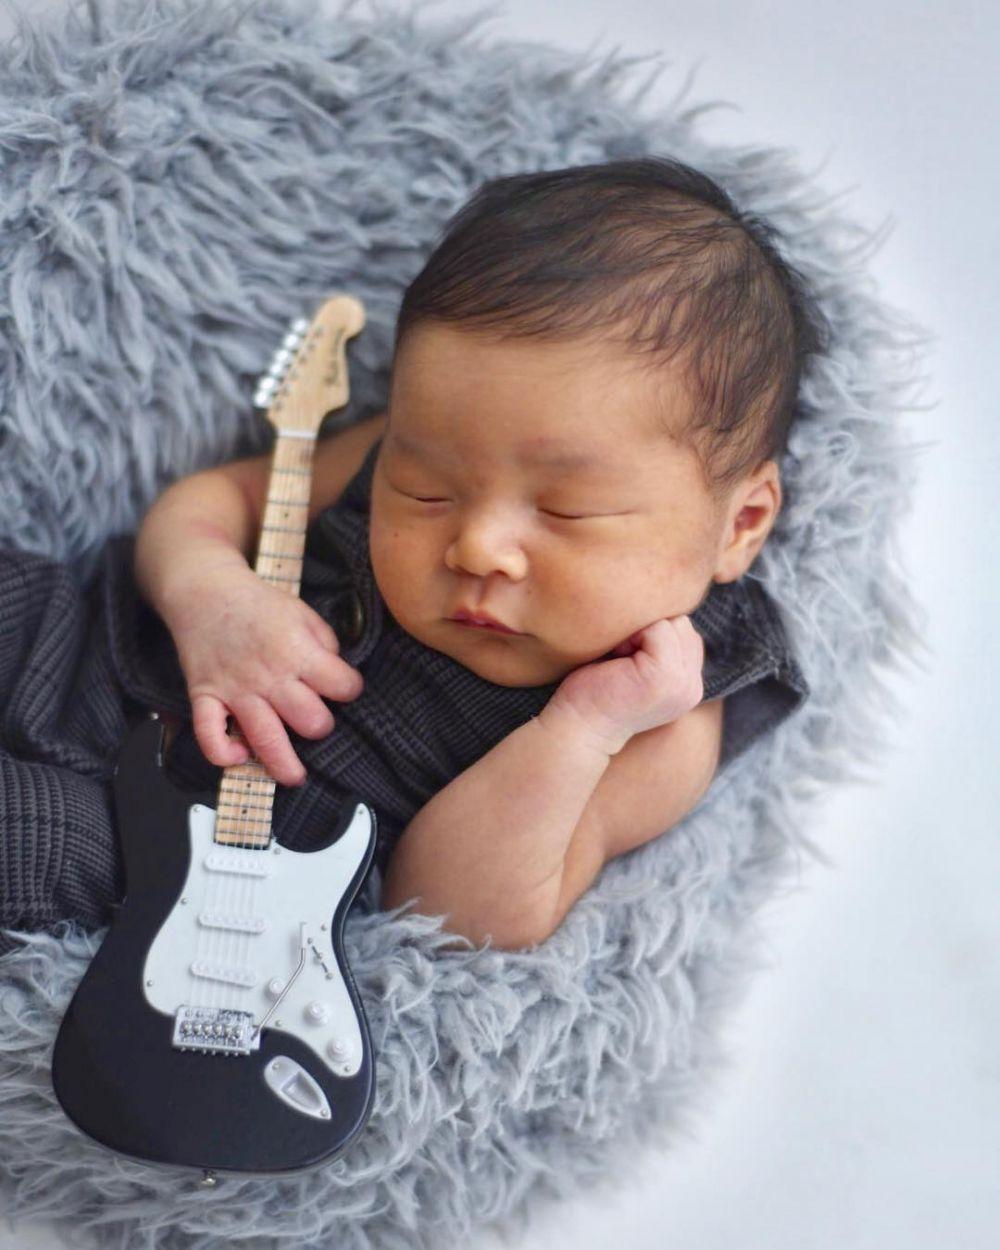 newborn musik © 2018 brilio.net